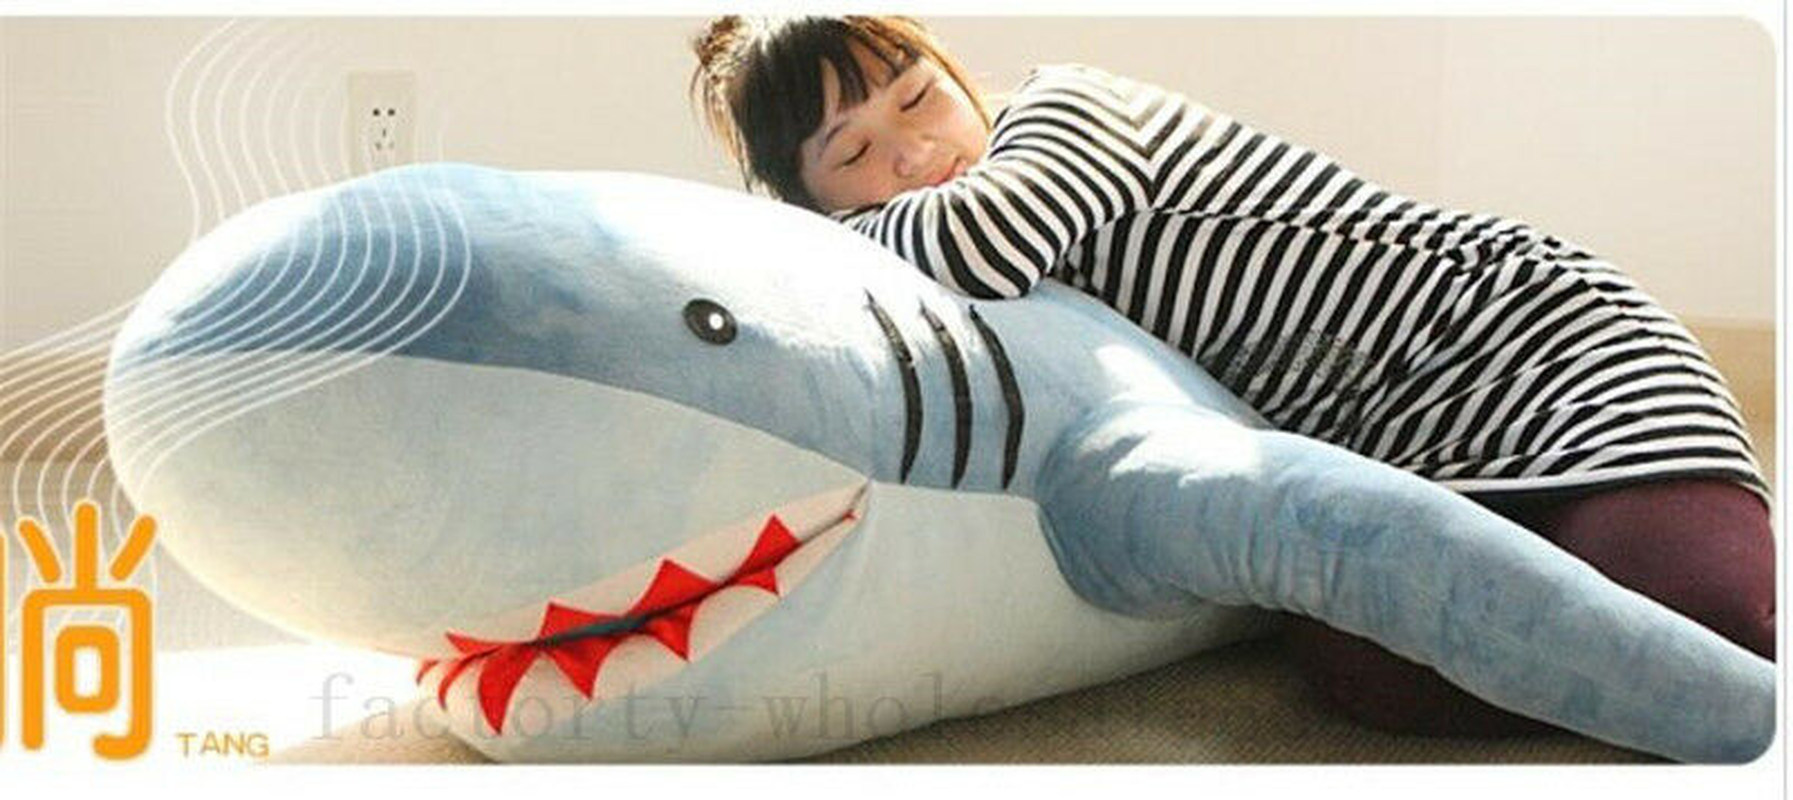 Giant Shark Plush Stuffed Animal Soft HugeToy Pillow Doll Sofa Xmas New Gift Hot